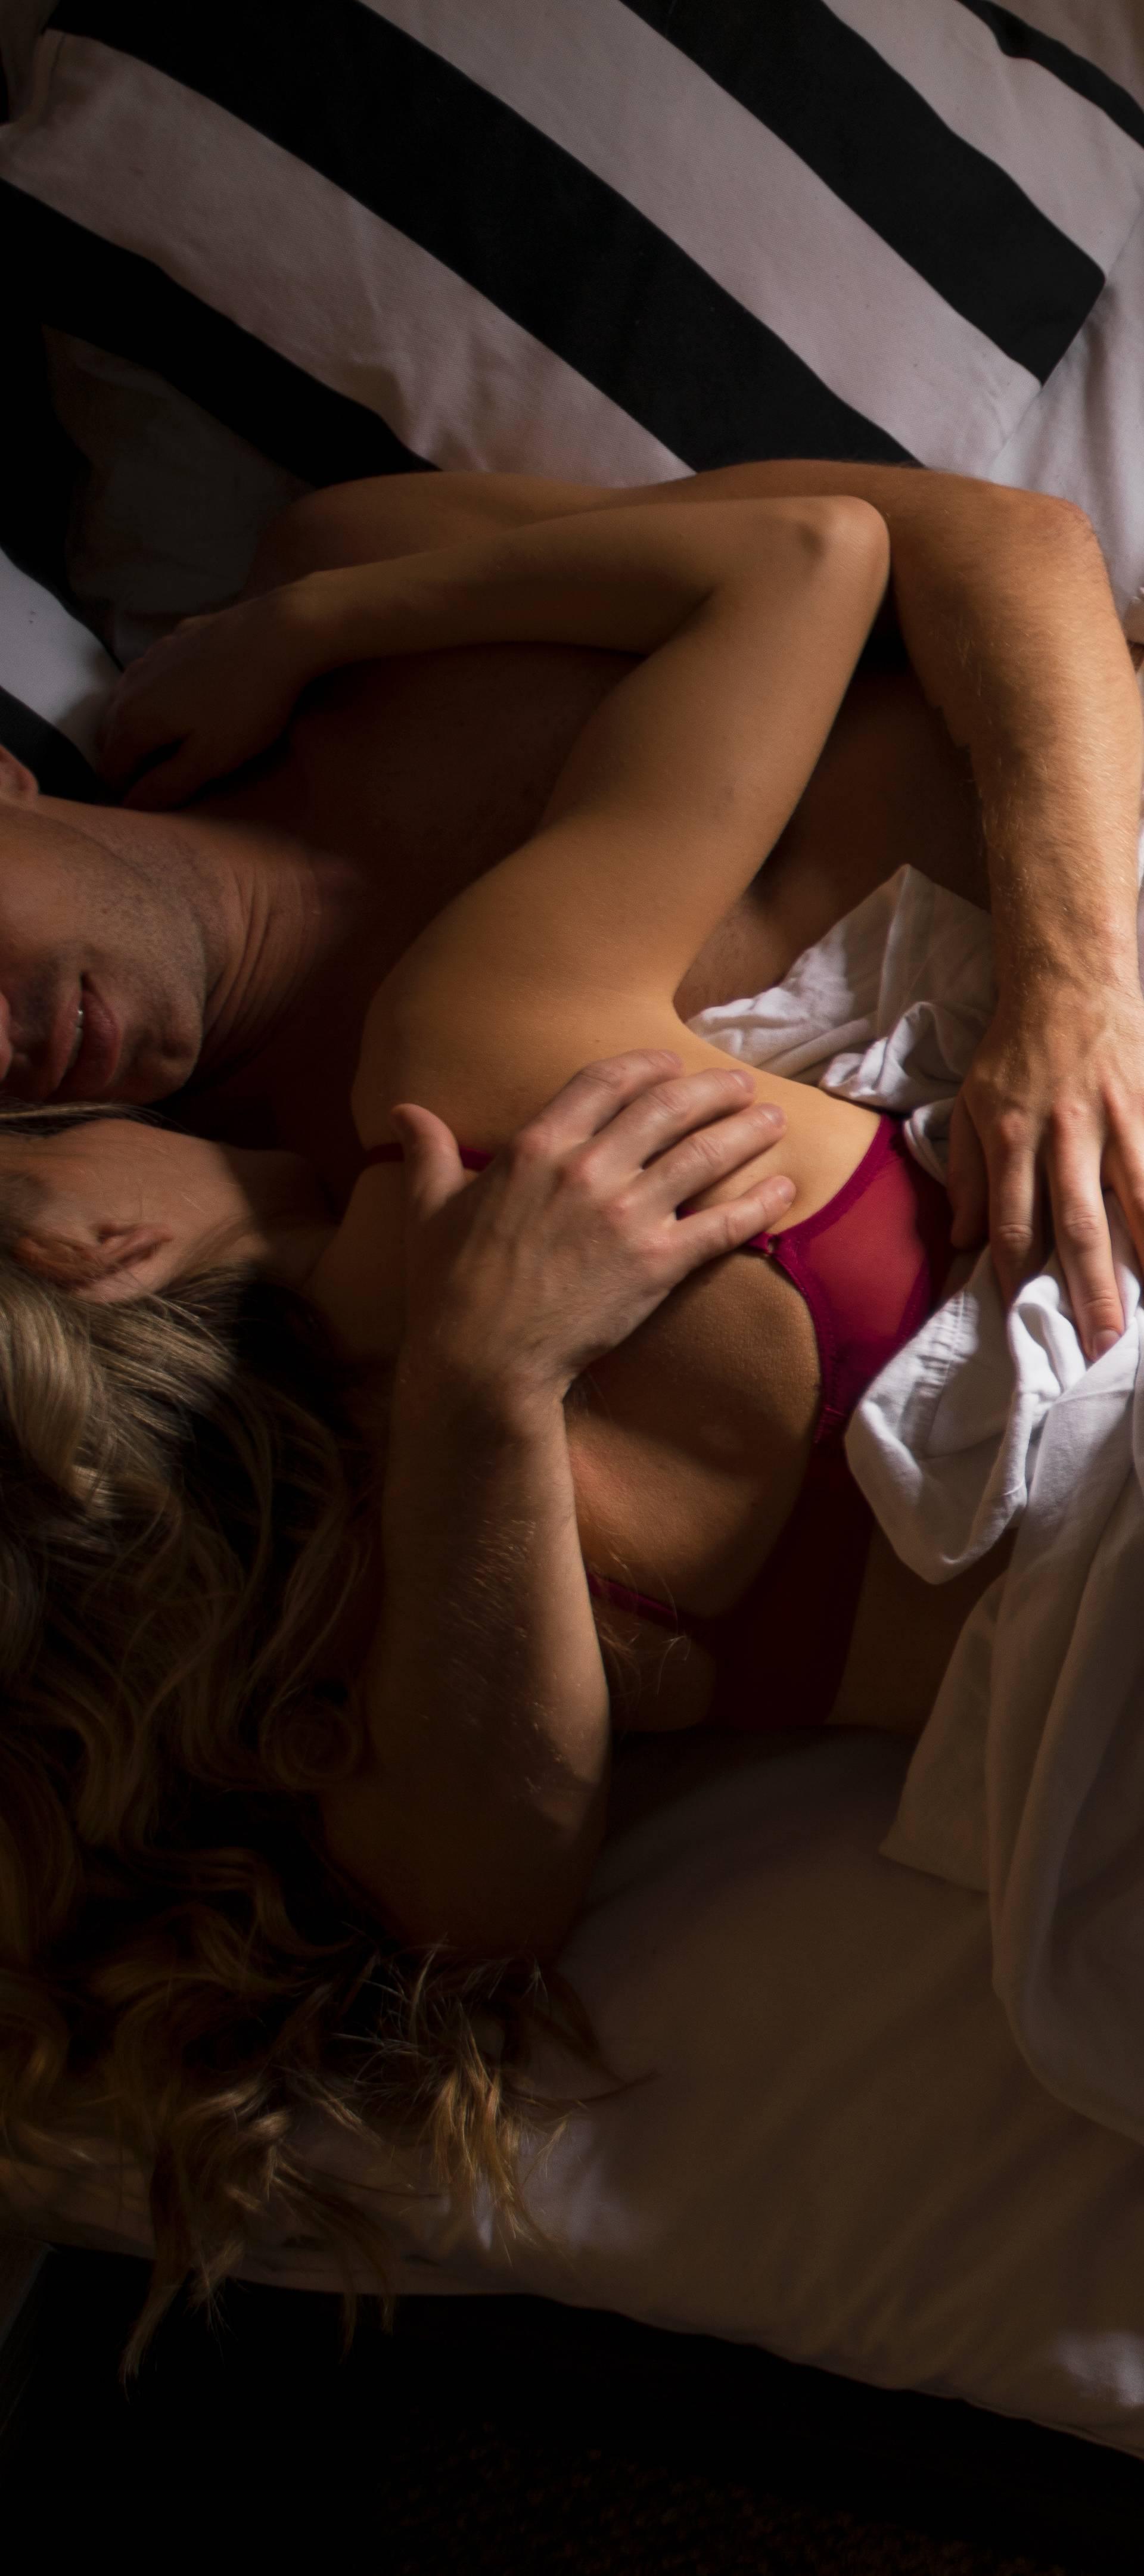 5 seks-stopera: Ljuti ste, nema seksa, orgazma, a ni razgovora